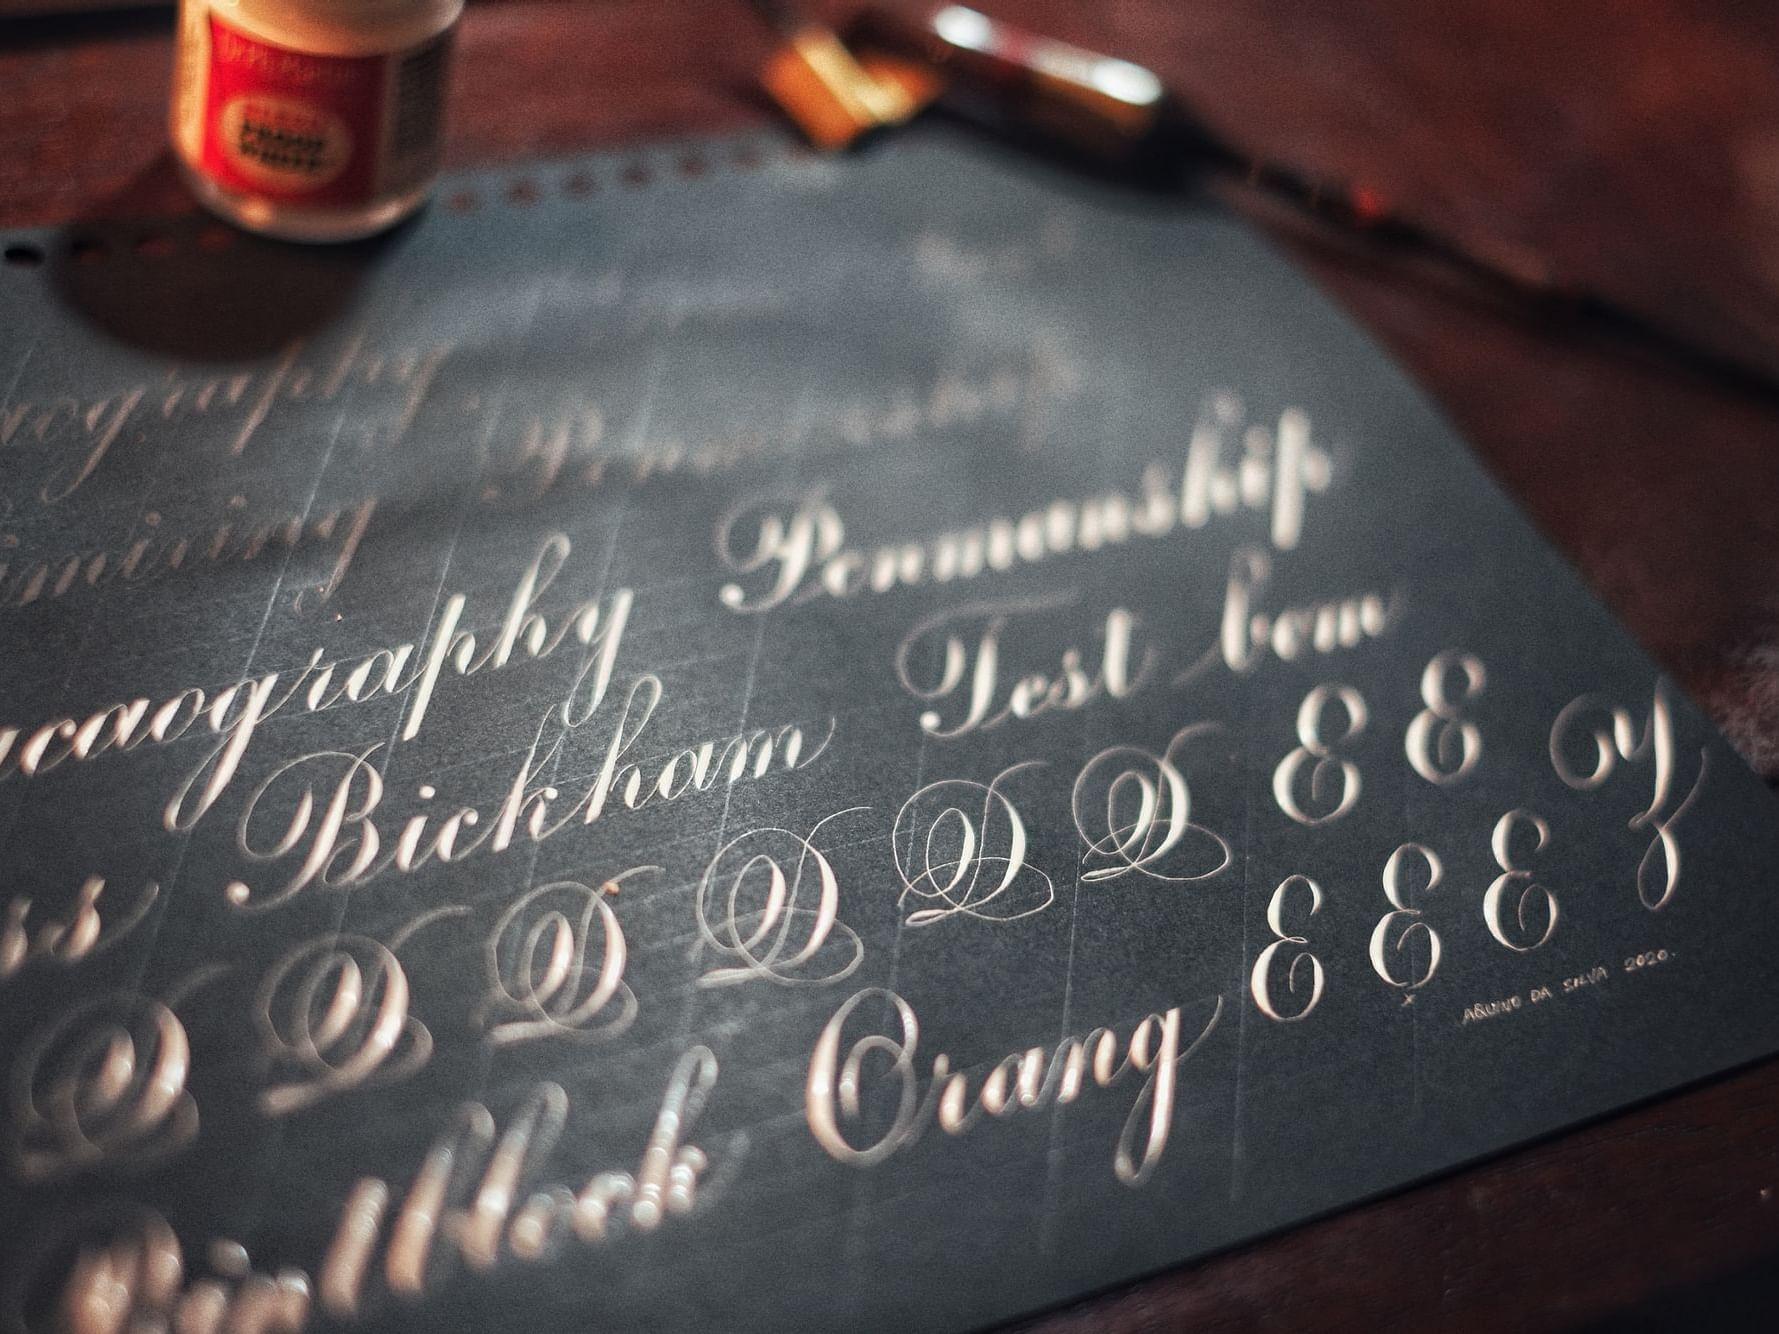 Post of Calligraphy Tasting Workshop Offer at Artyzen GrandLapa